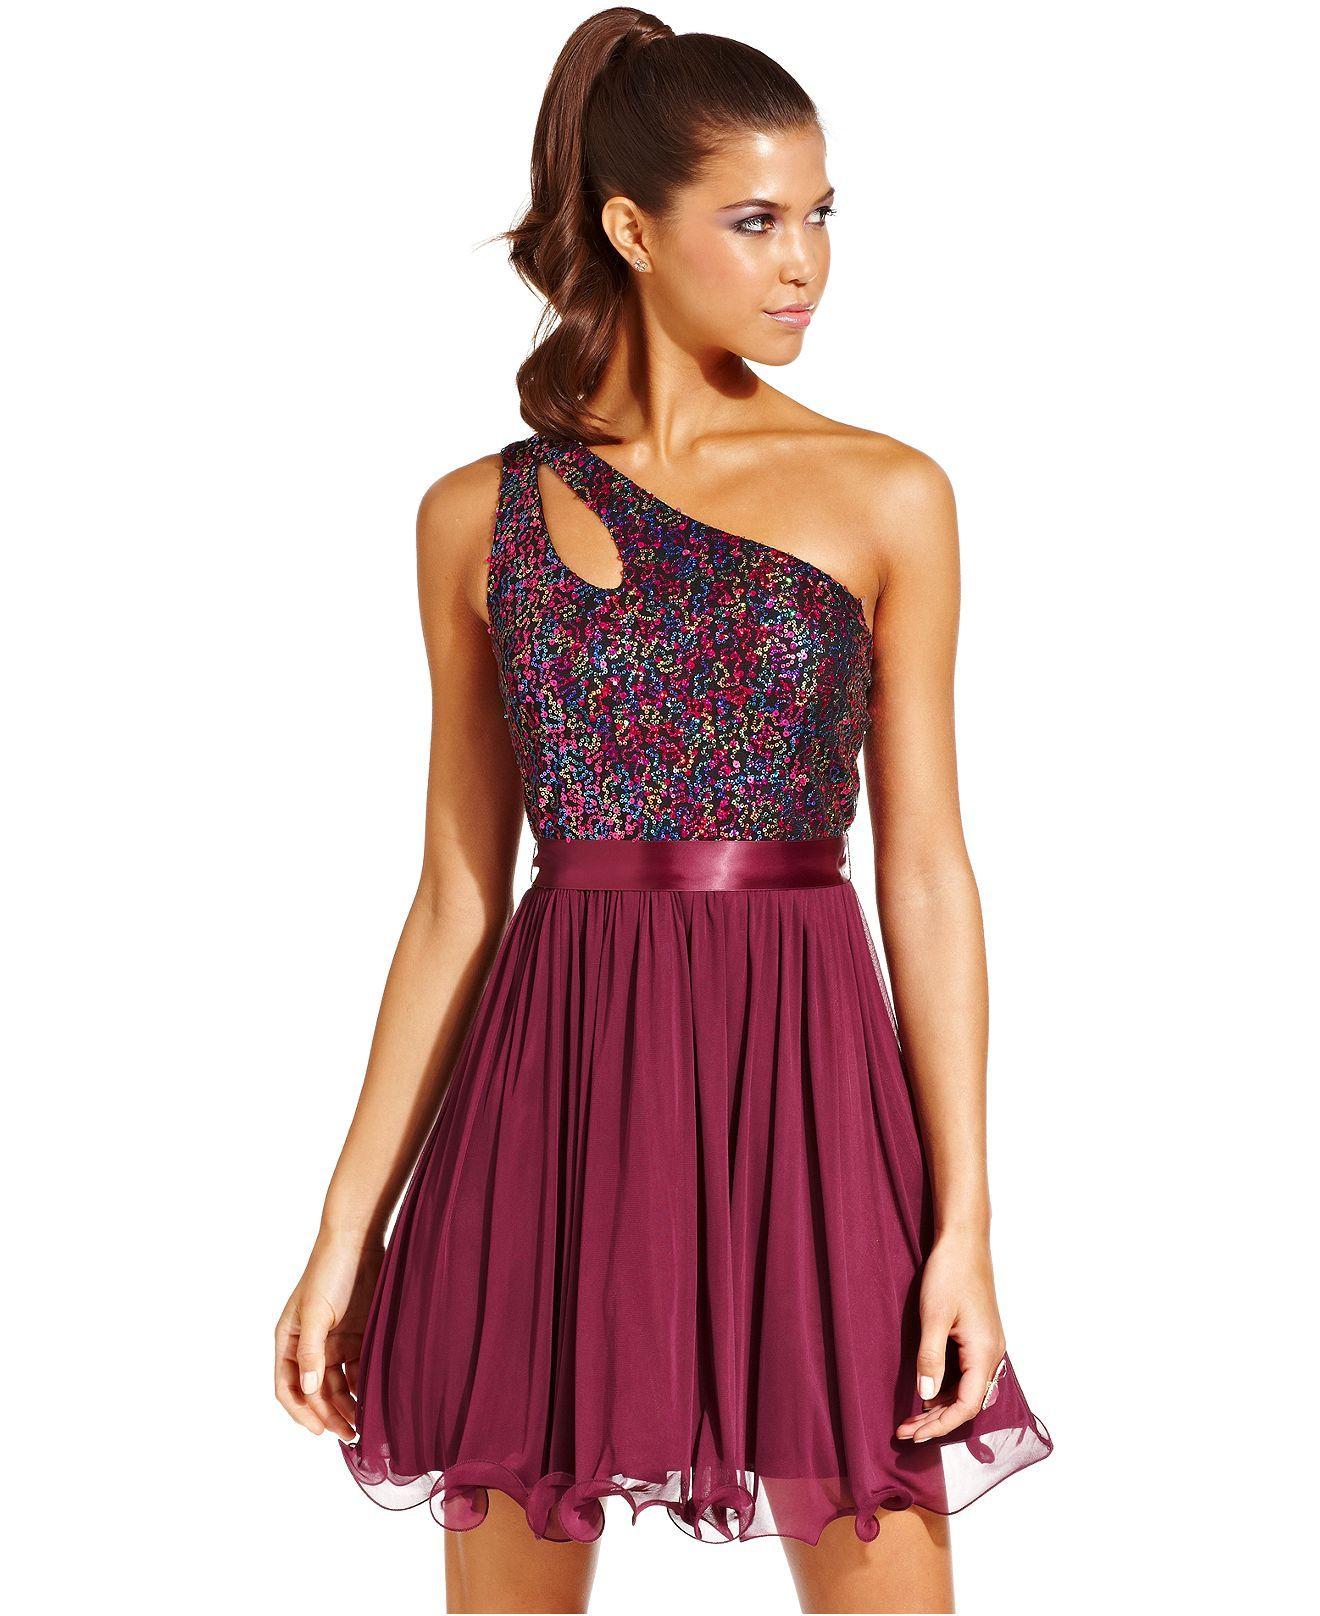 22++ Sequin hearts dress ideas